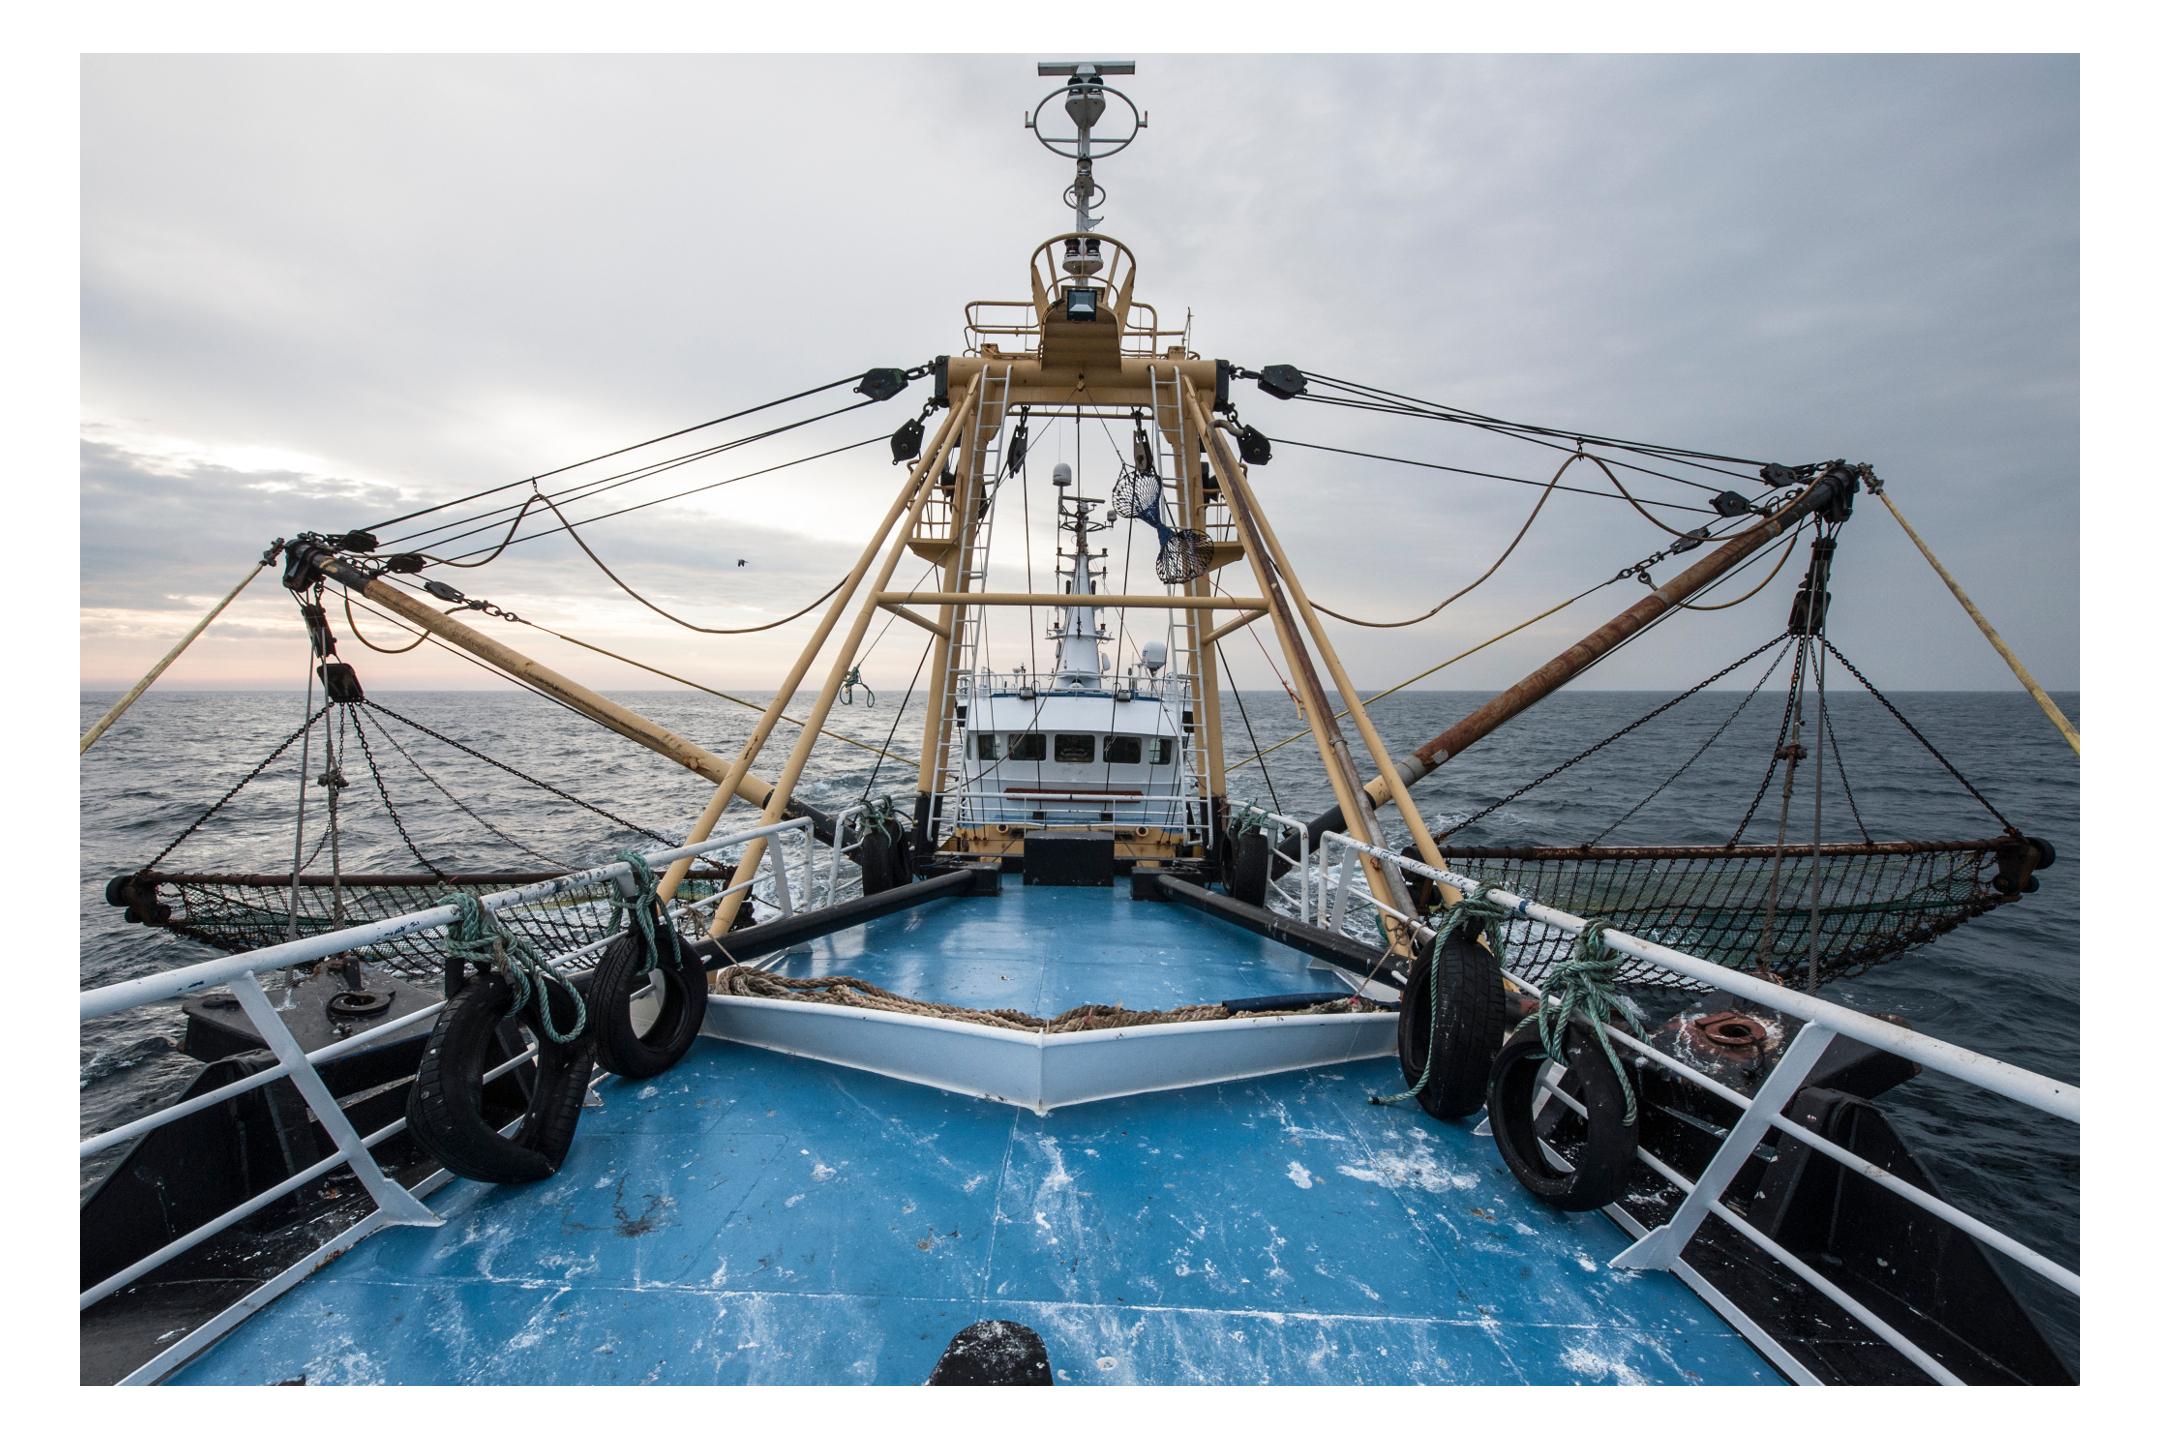 waterdance_margaret_beam_trawler.jpg